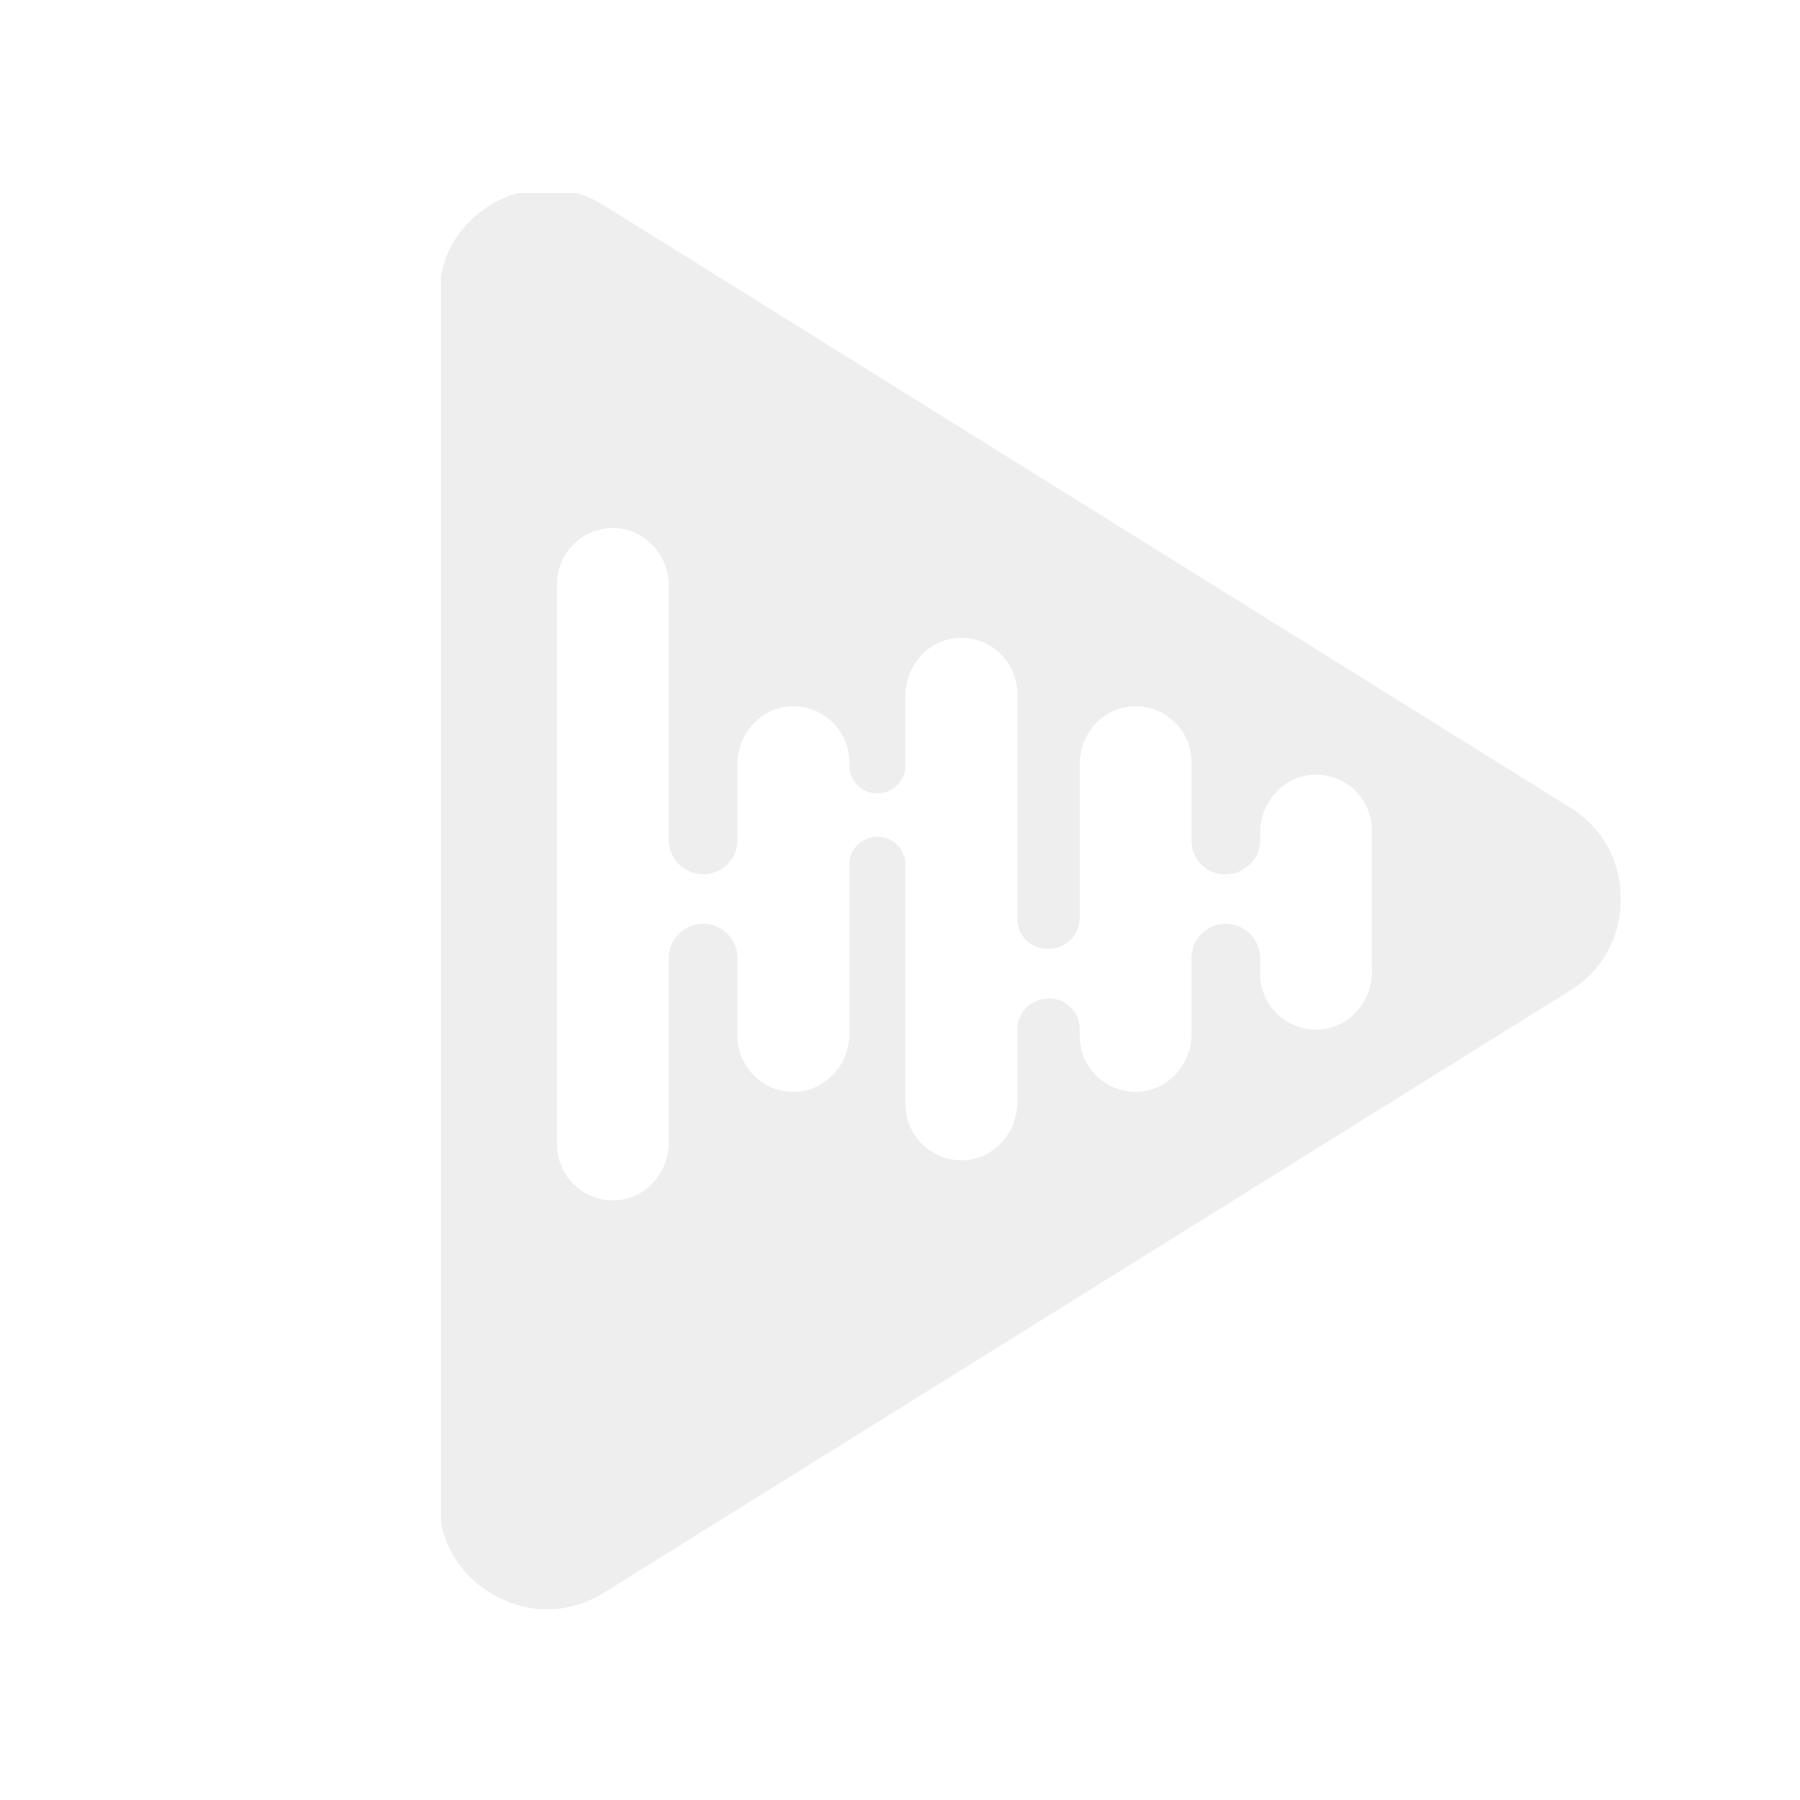 Grandview 148603 - Lerret Cyber, 16:9, 171x96, Manuelt 77